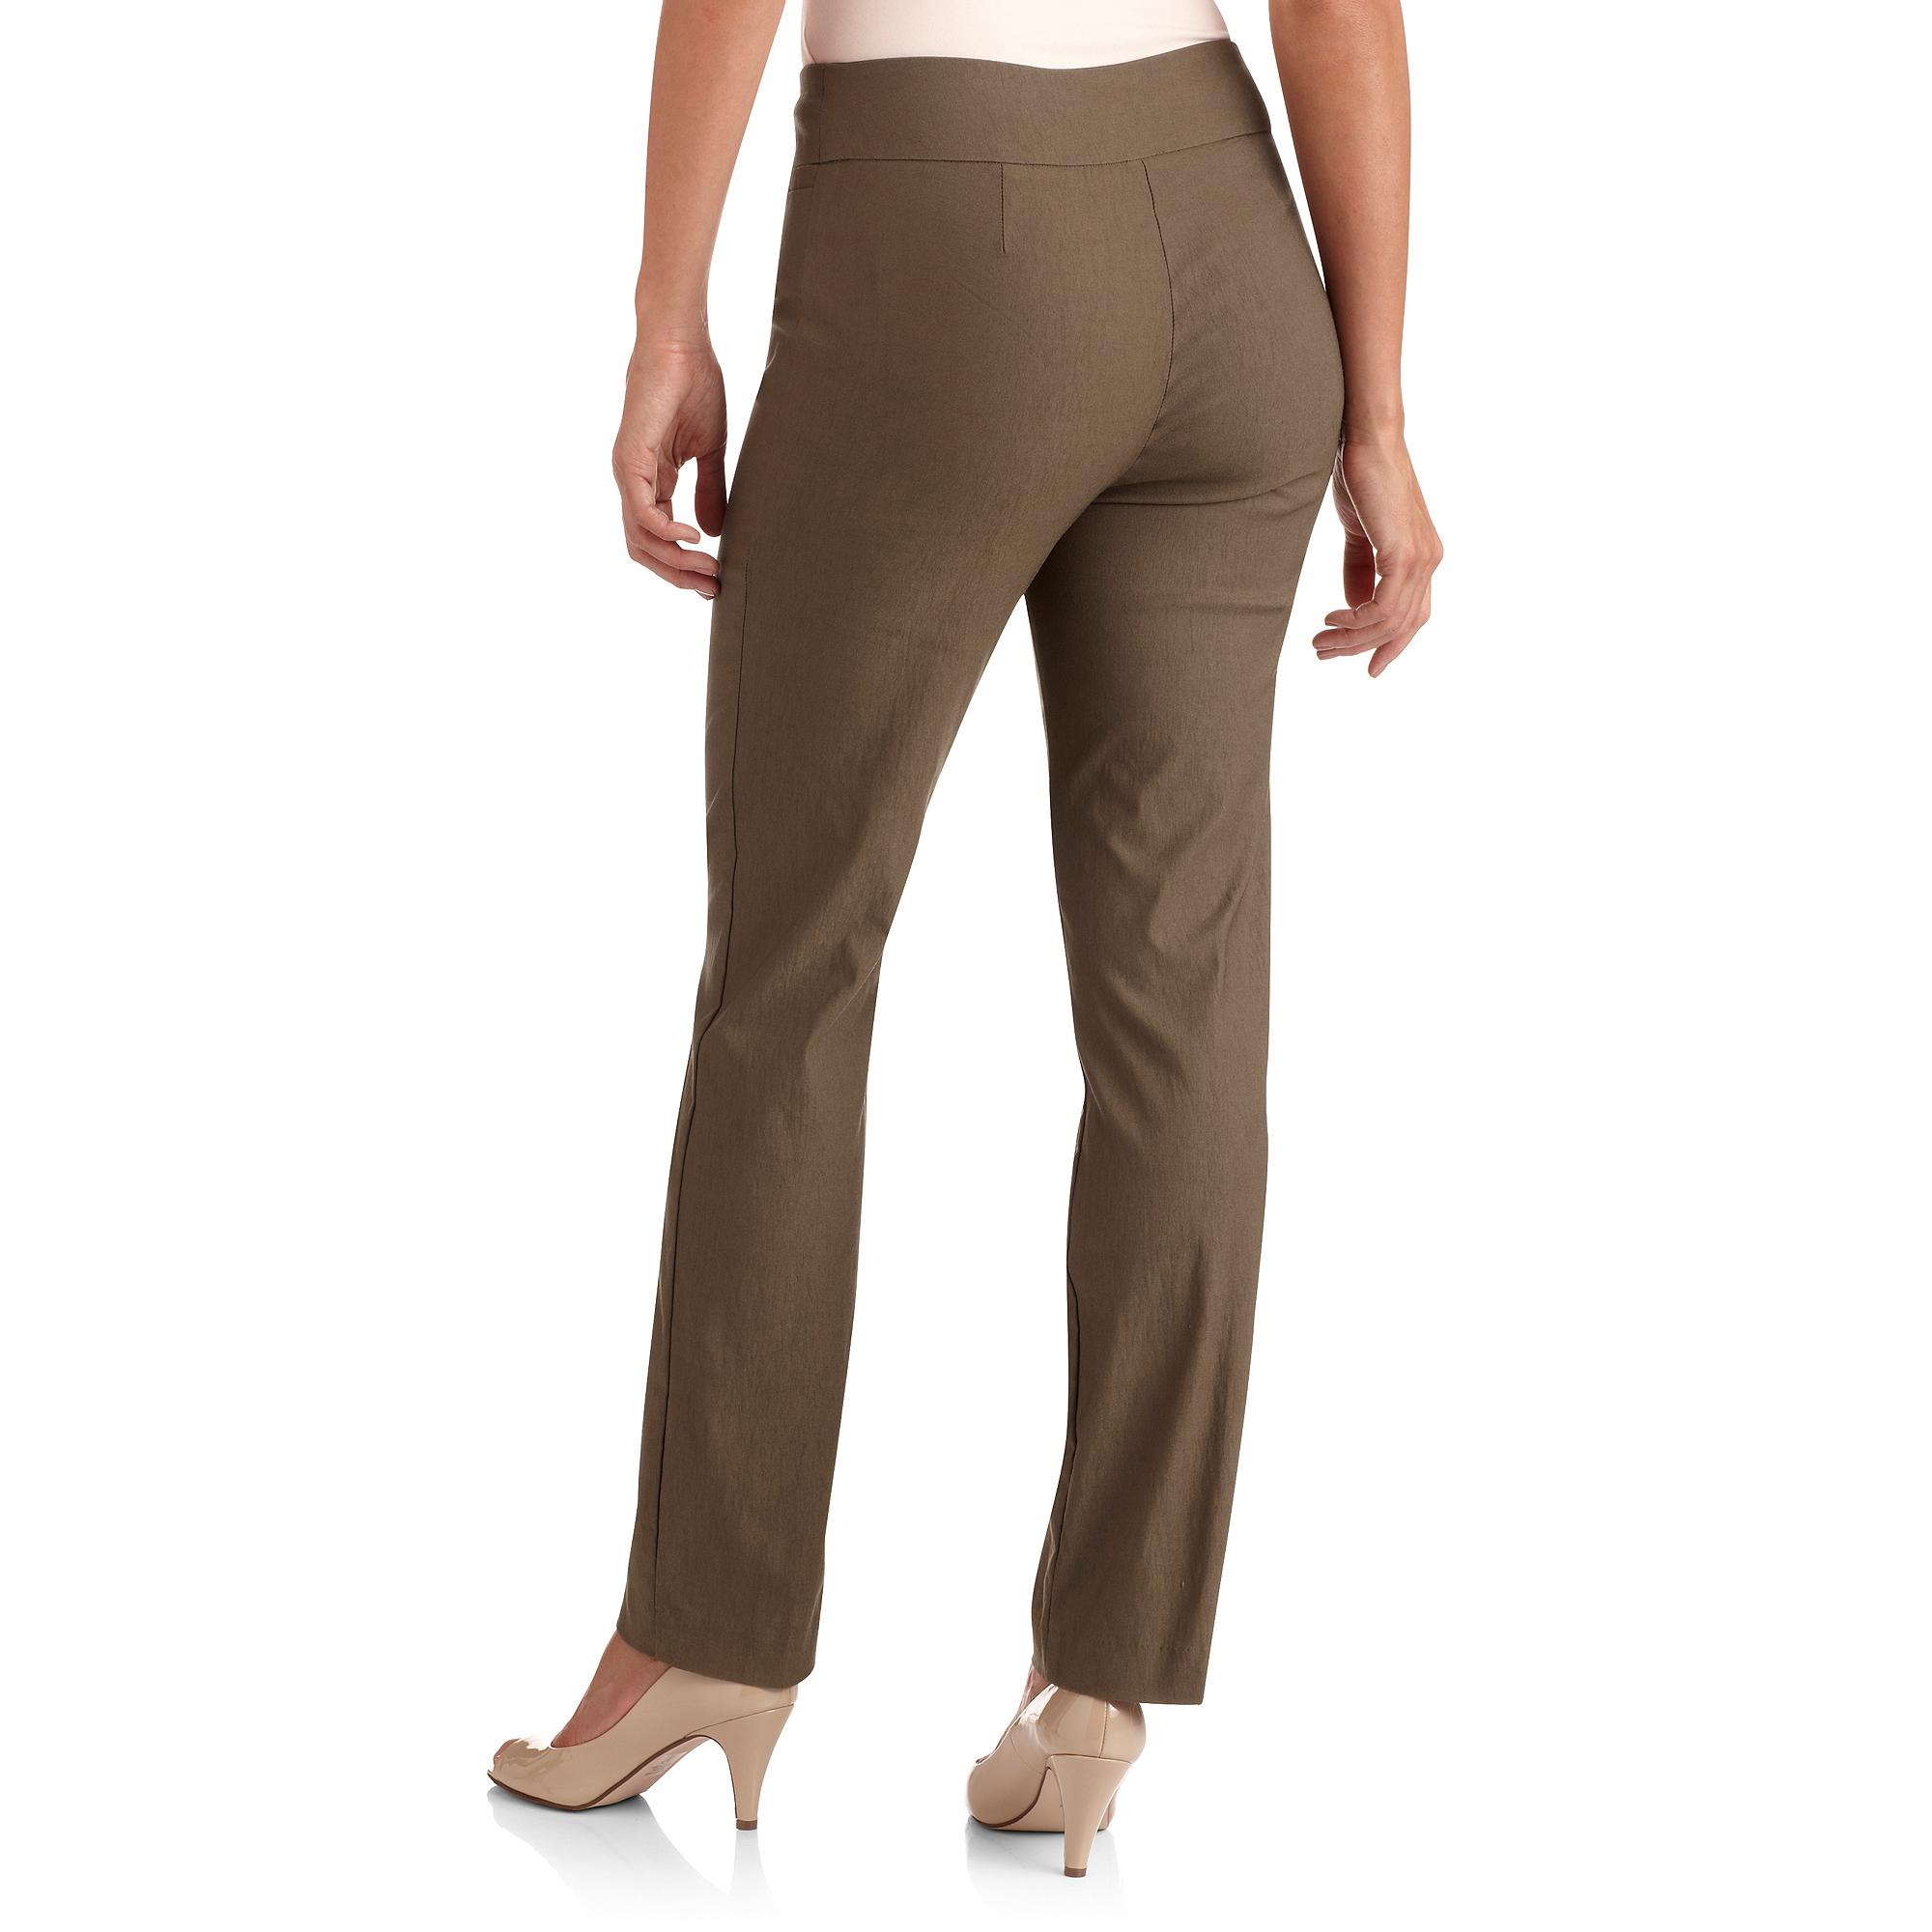 Women's Millenium Pull-On Pants